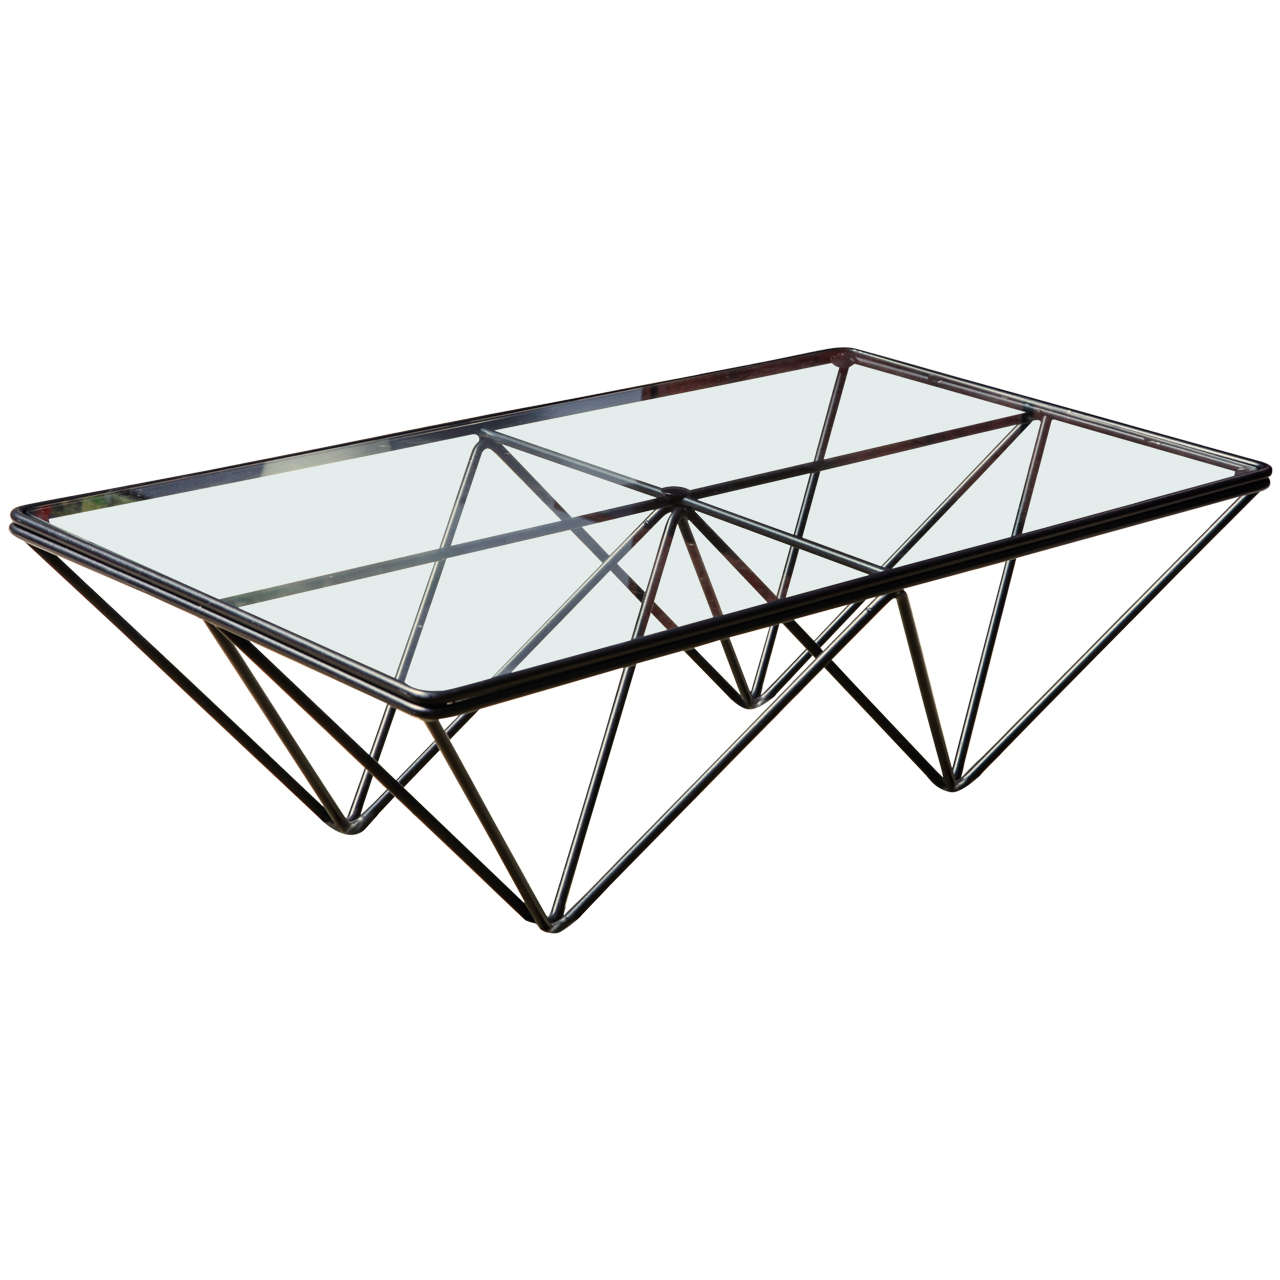 Alanda Table By Paolo Piva At 1stdibs